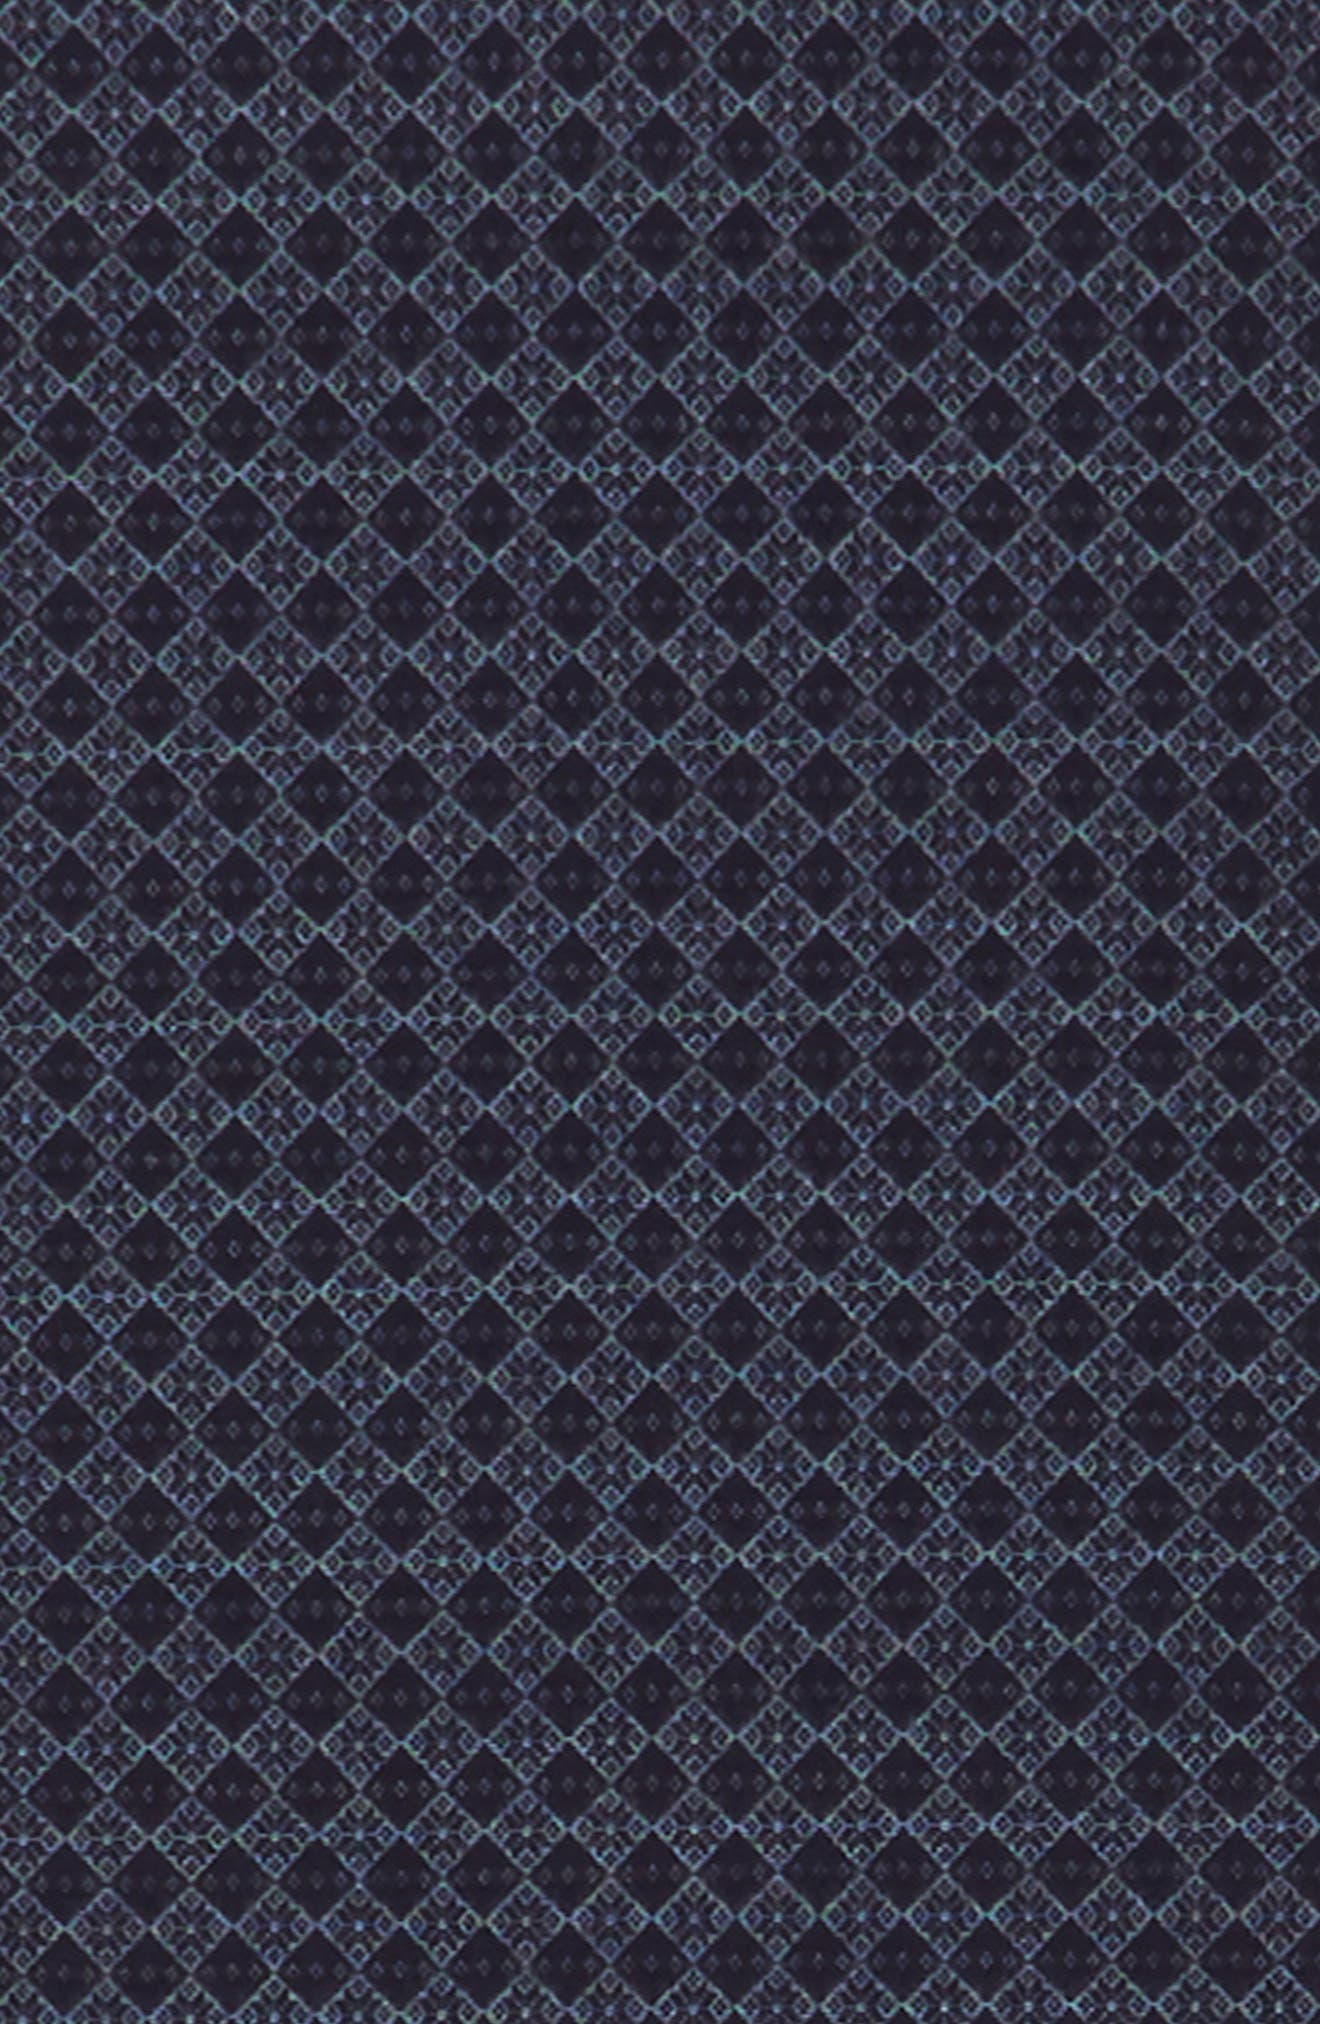 Diamond Weave Silk Blend Scarf,                             Alternate thumbnail 3, color,                             410